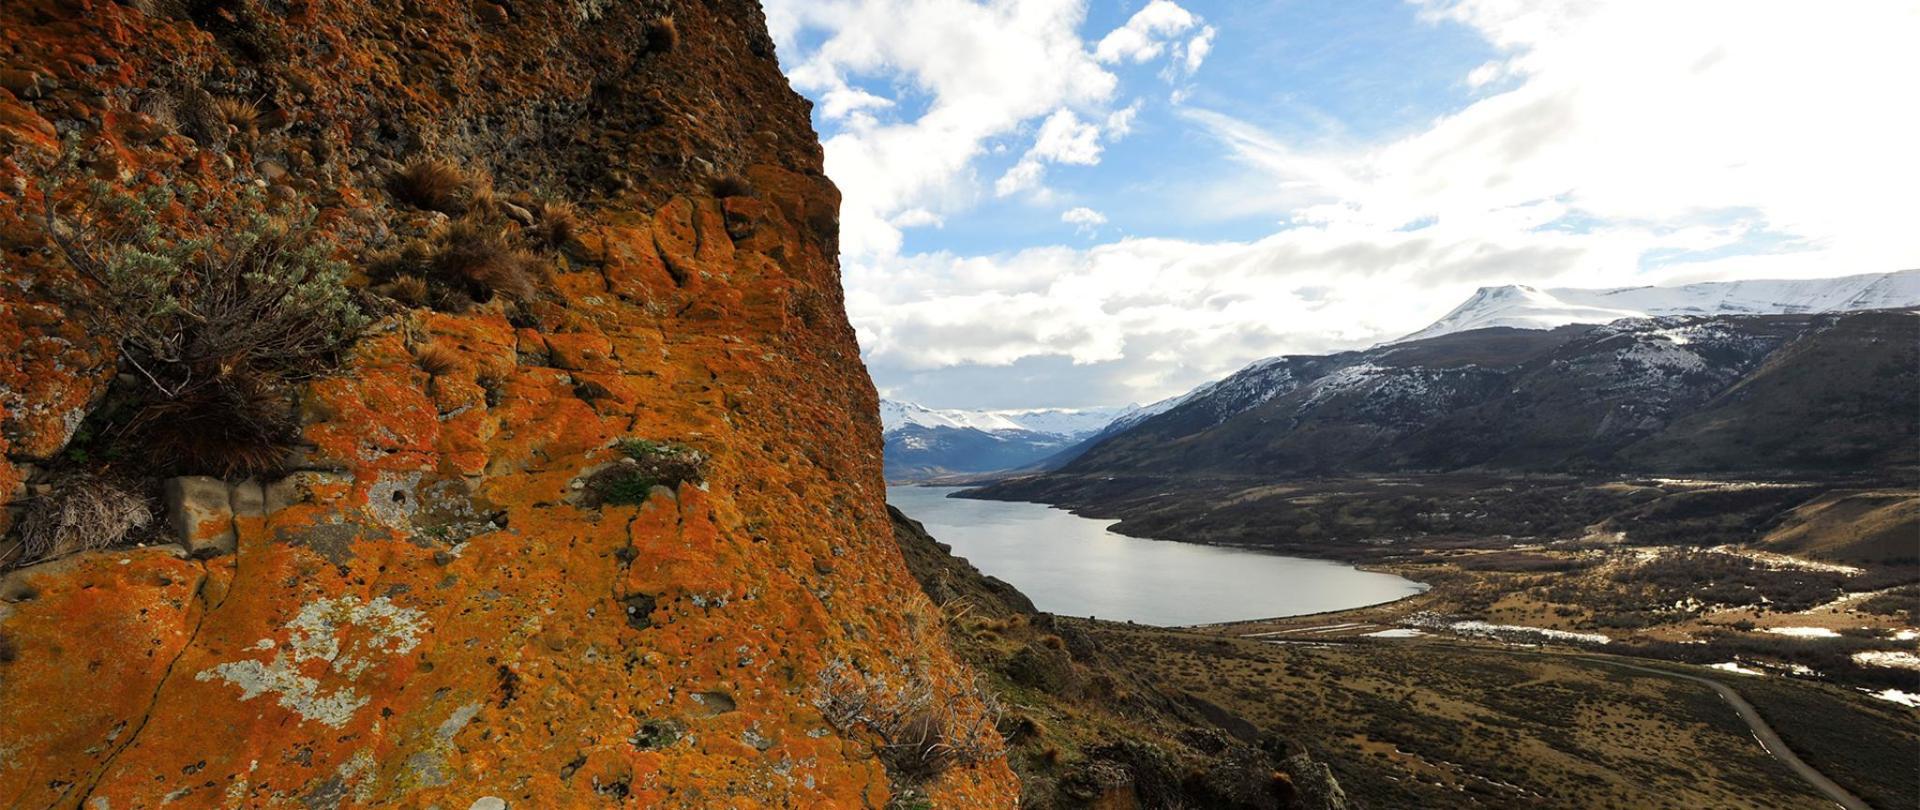 Patagonia-Chilena.jpg